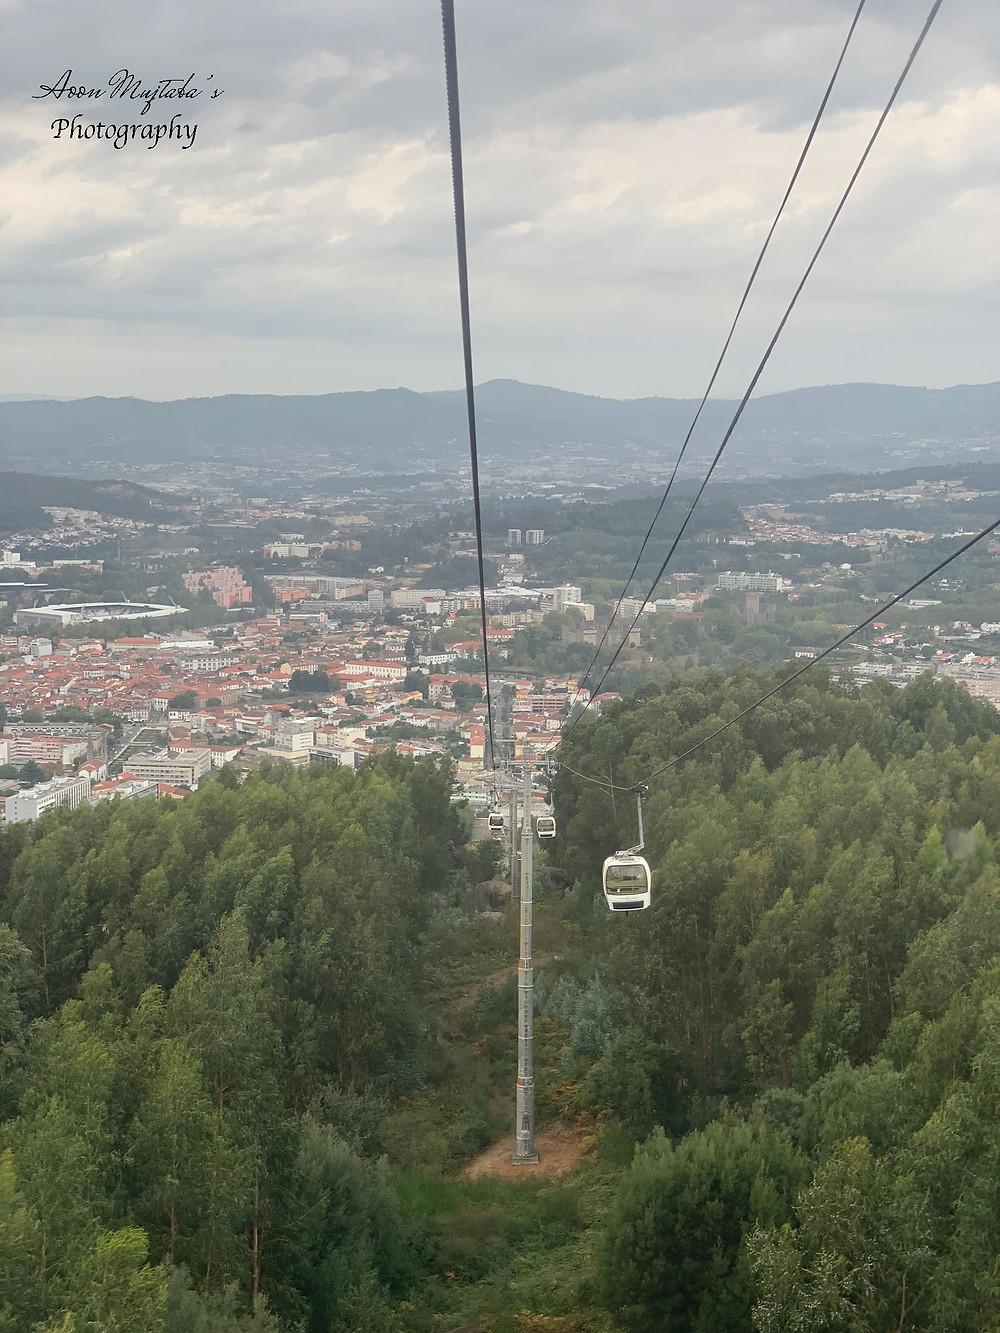 Teleférico in Guimarães, Portugal